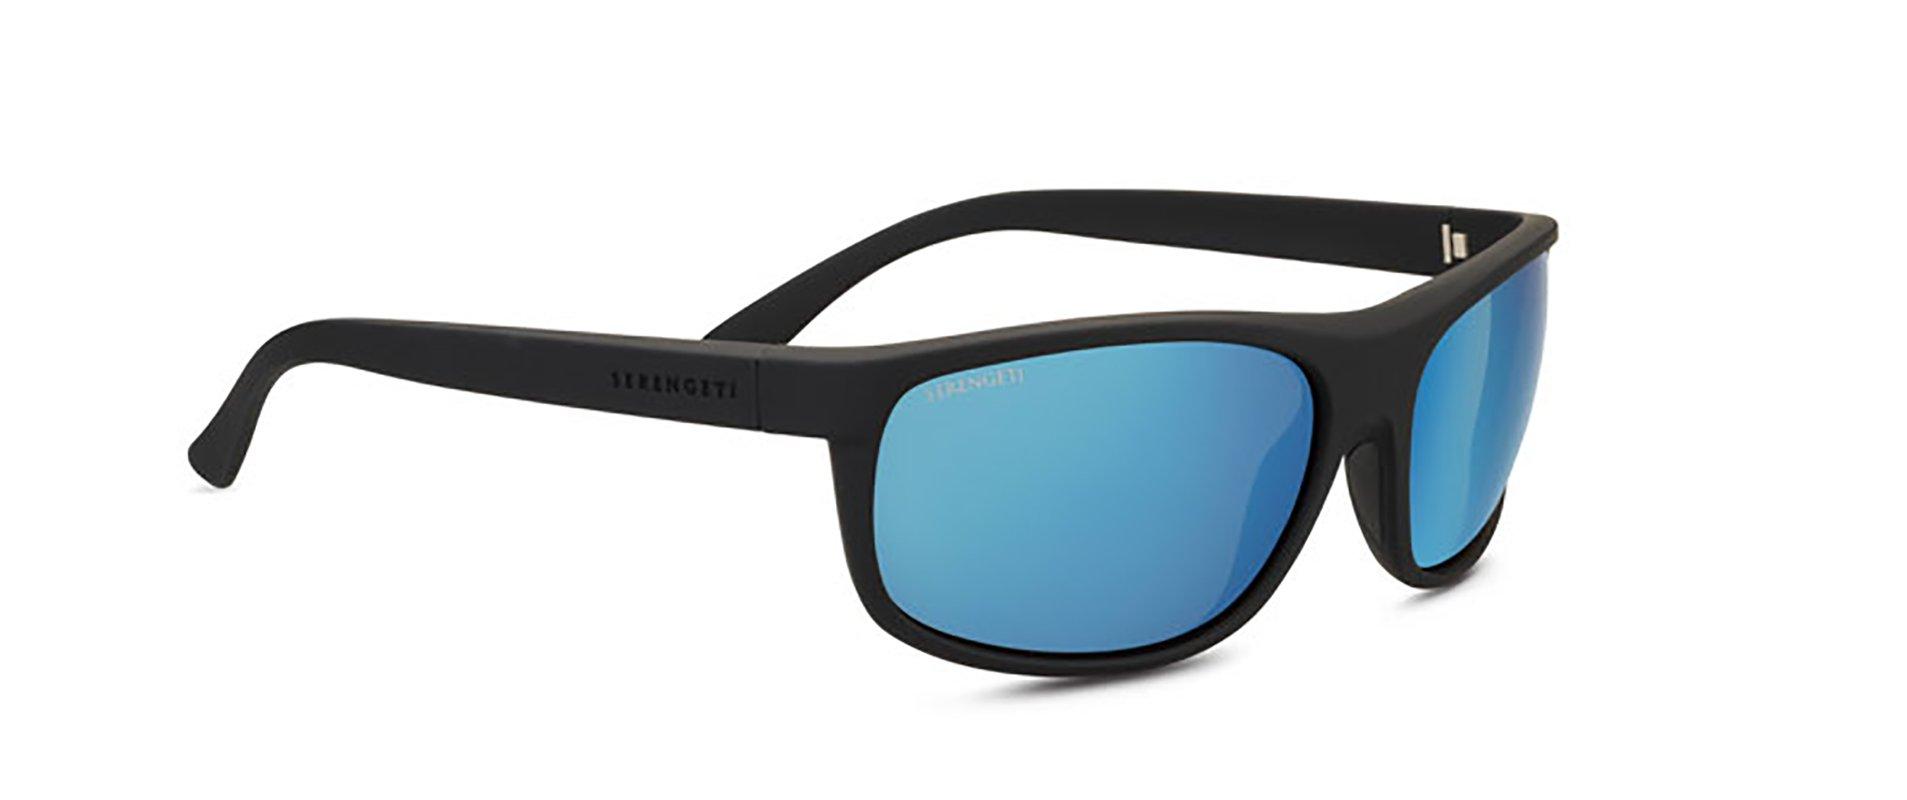 Serengeti Alessio Sunglasses, black Blue by Serengeti (Image #1)